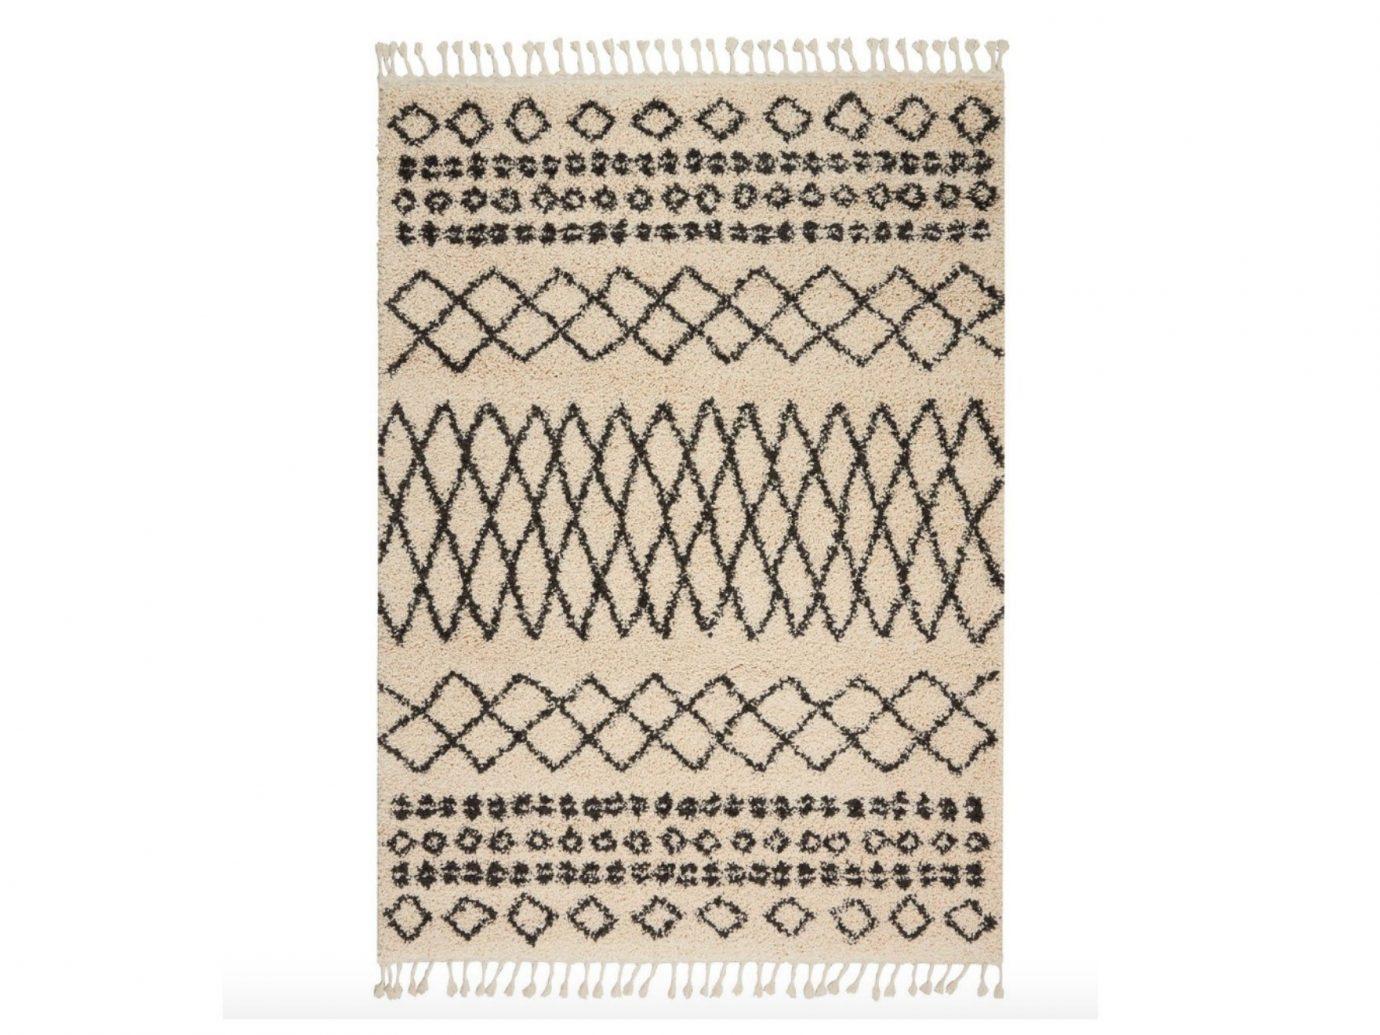 City Copenhagen Kyoto Marrakech Palm Springs Style + Design Travel Shop Tulum text line font area pattern product rectangle fabric